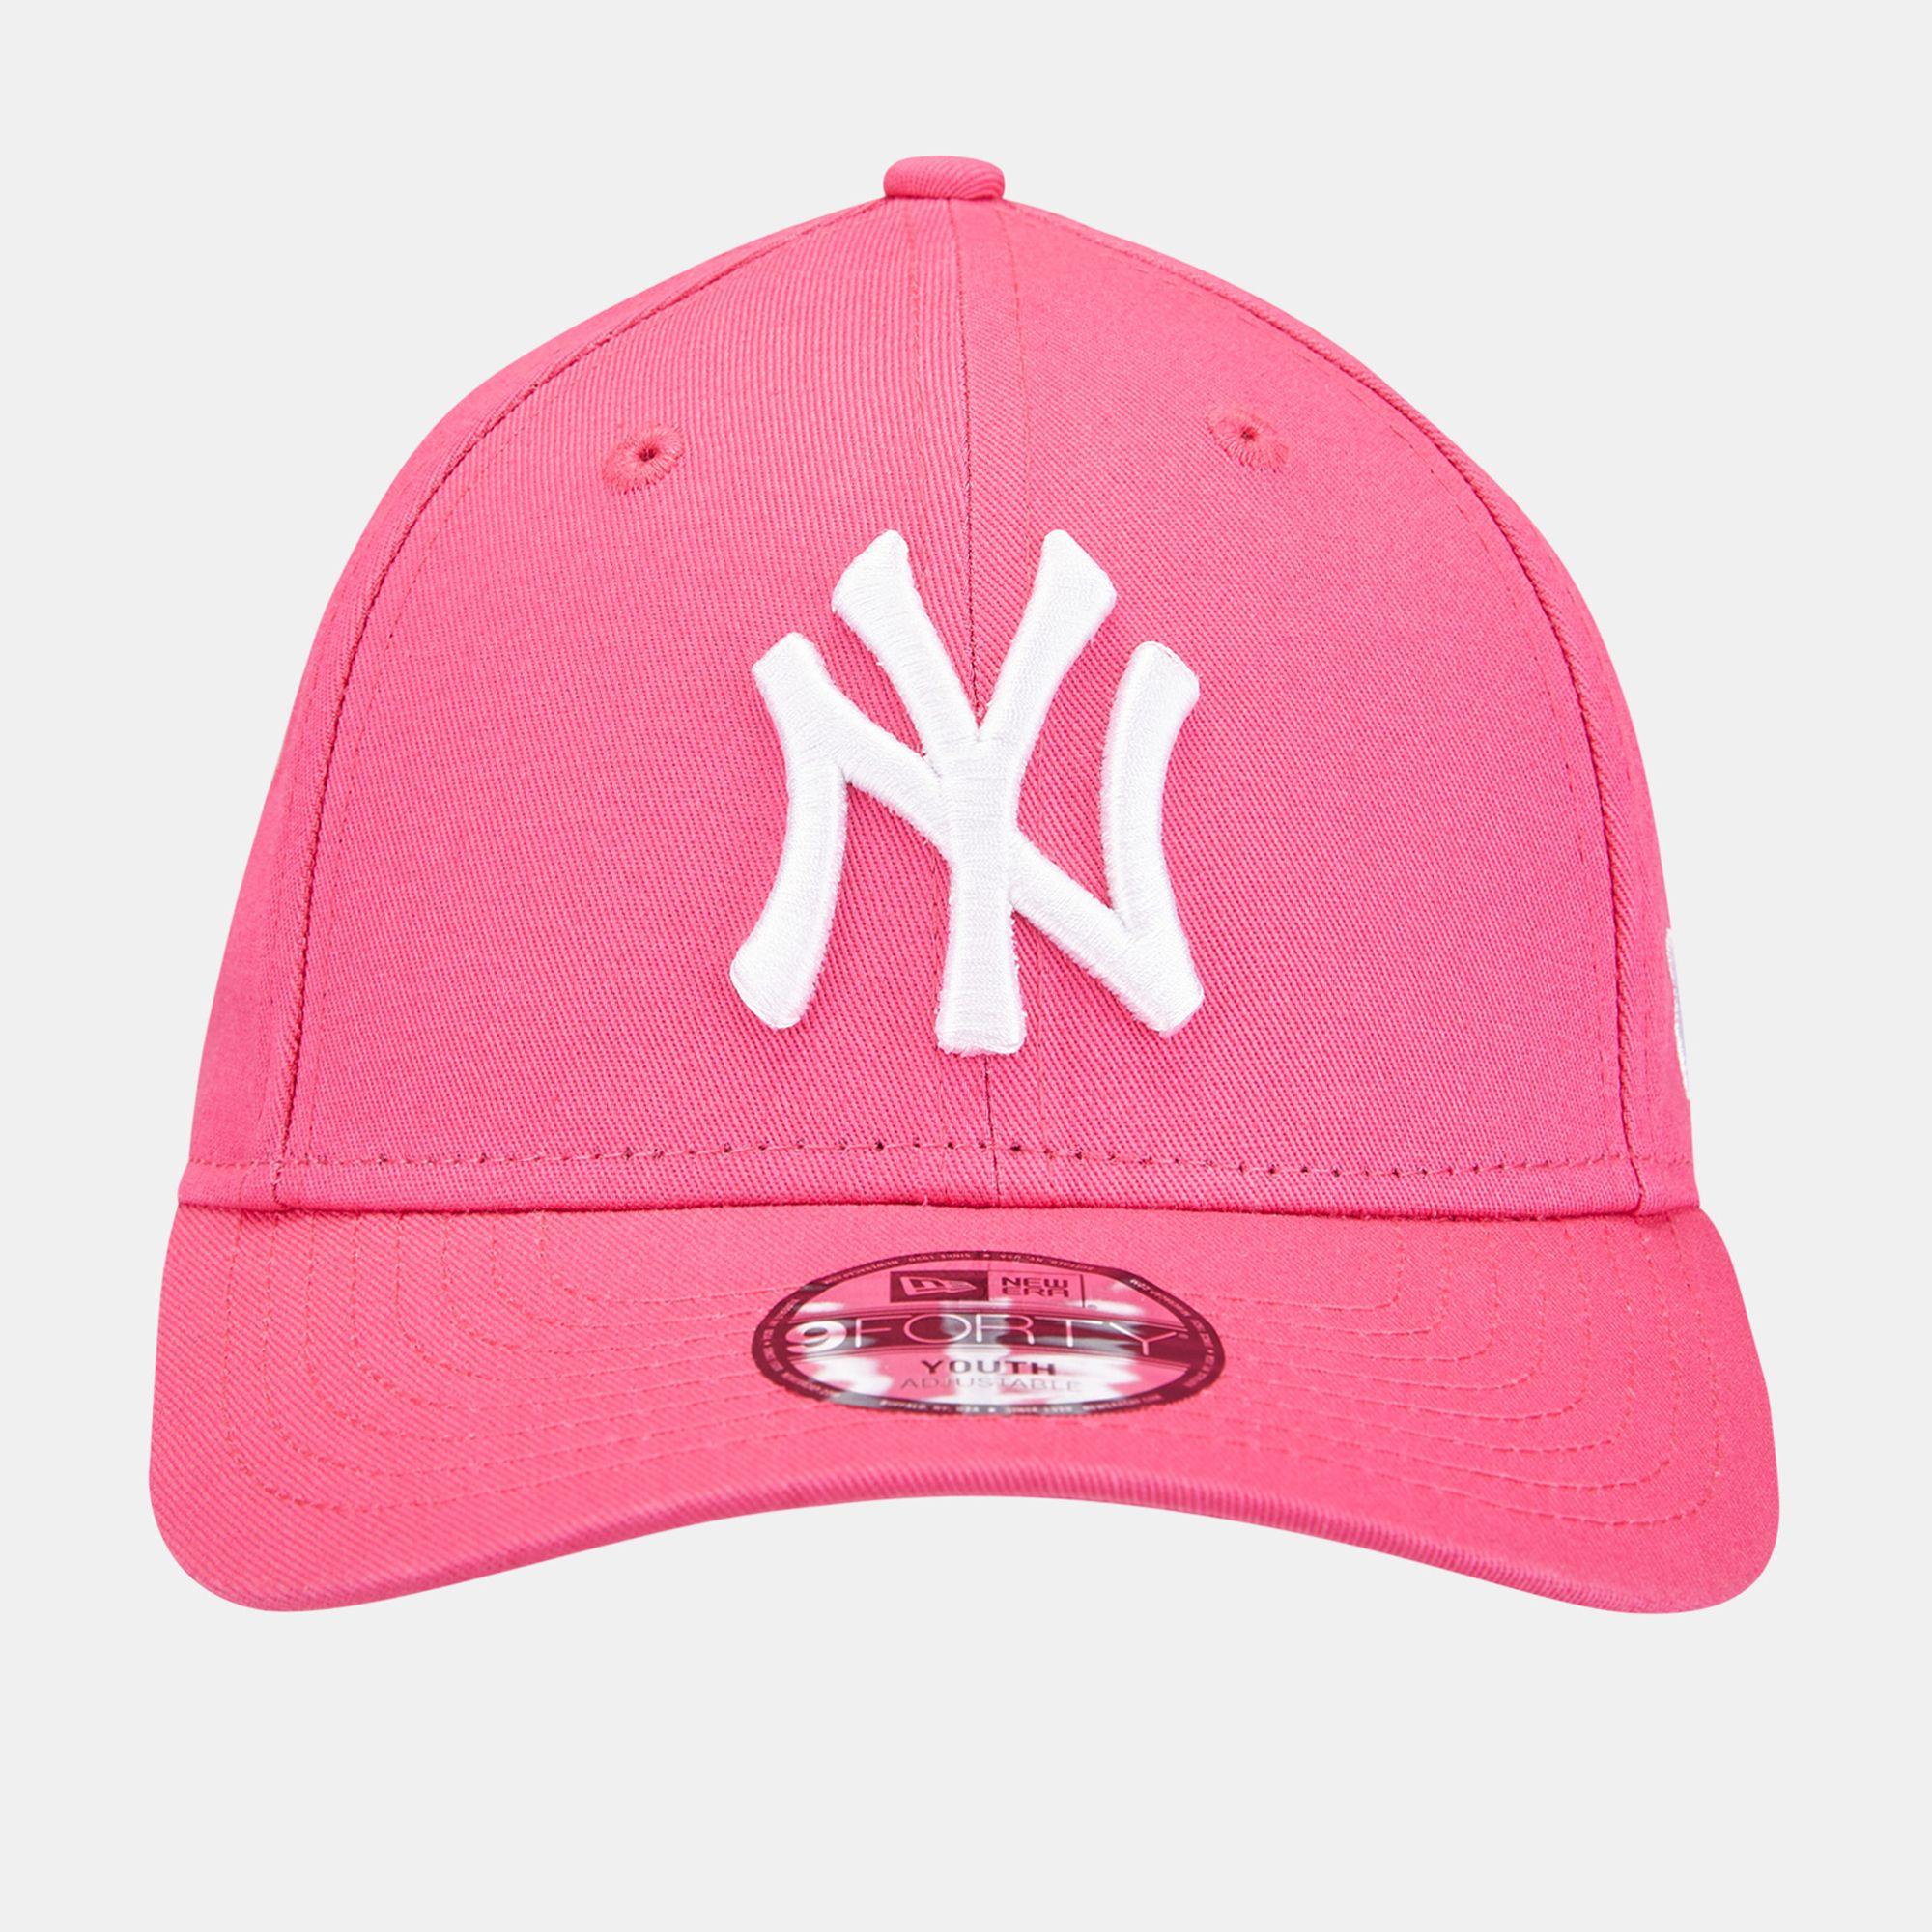 New Era Kids' MLB League Basic New York Yankees 9FORTY Cap  c7f35300eba